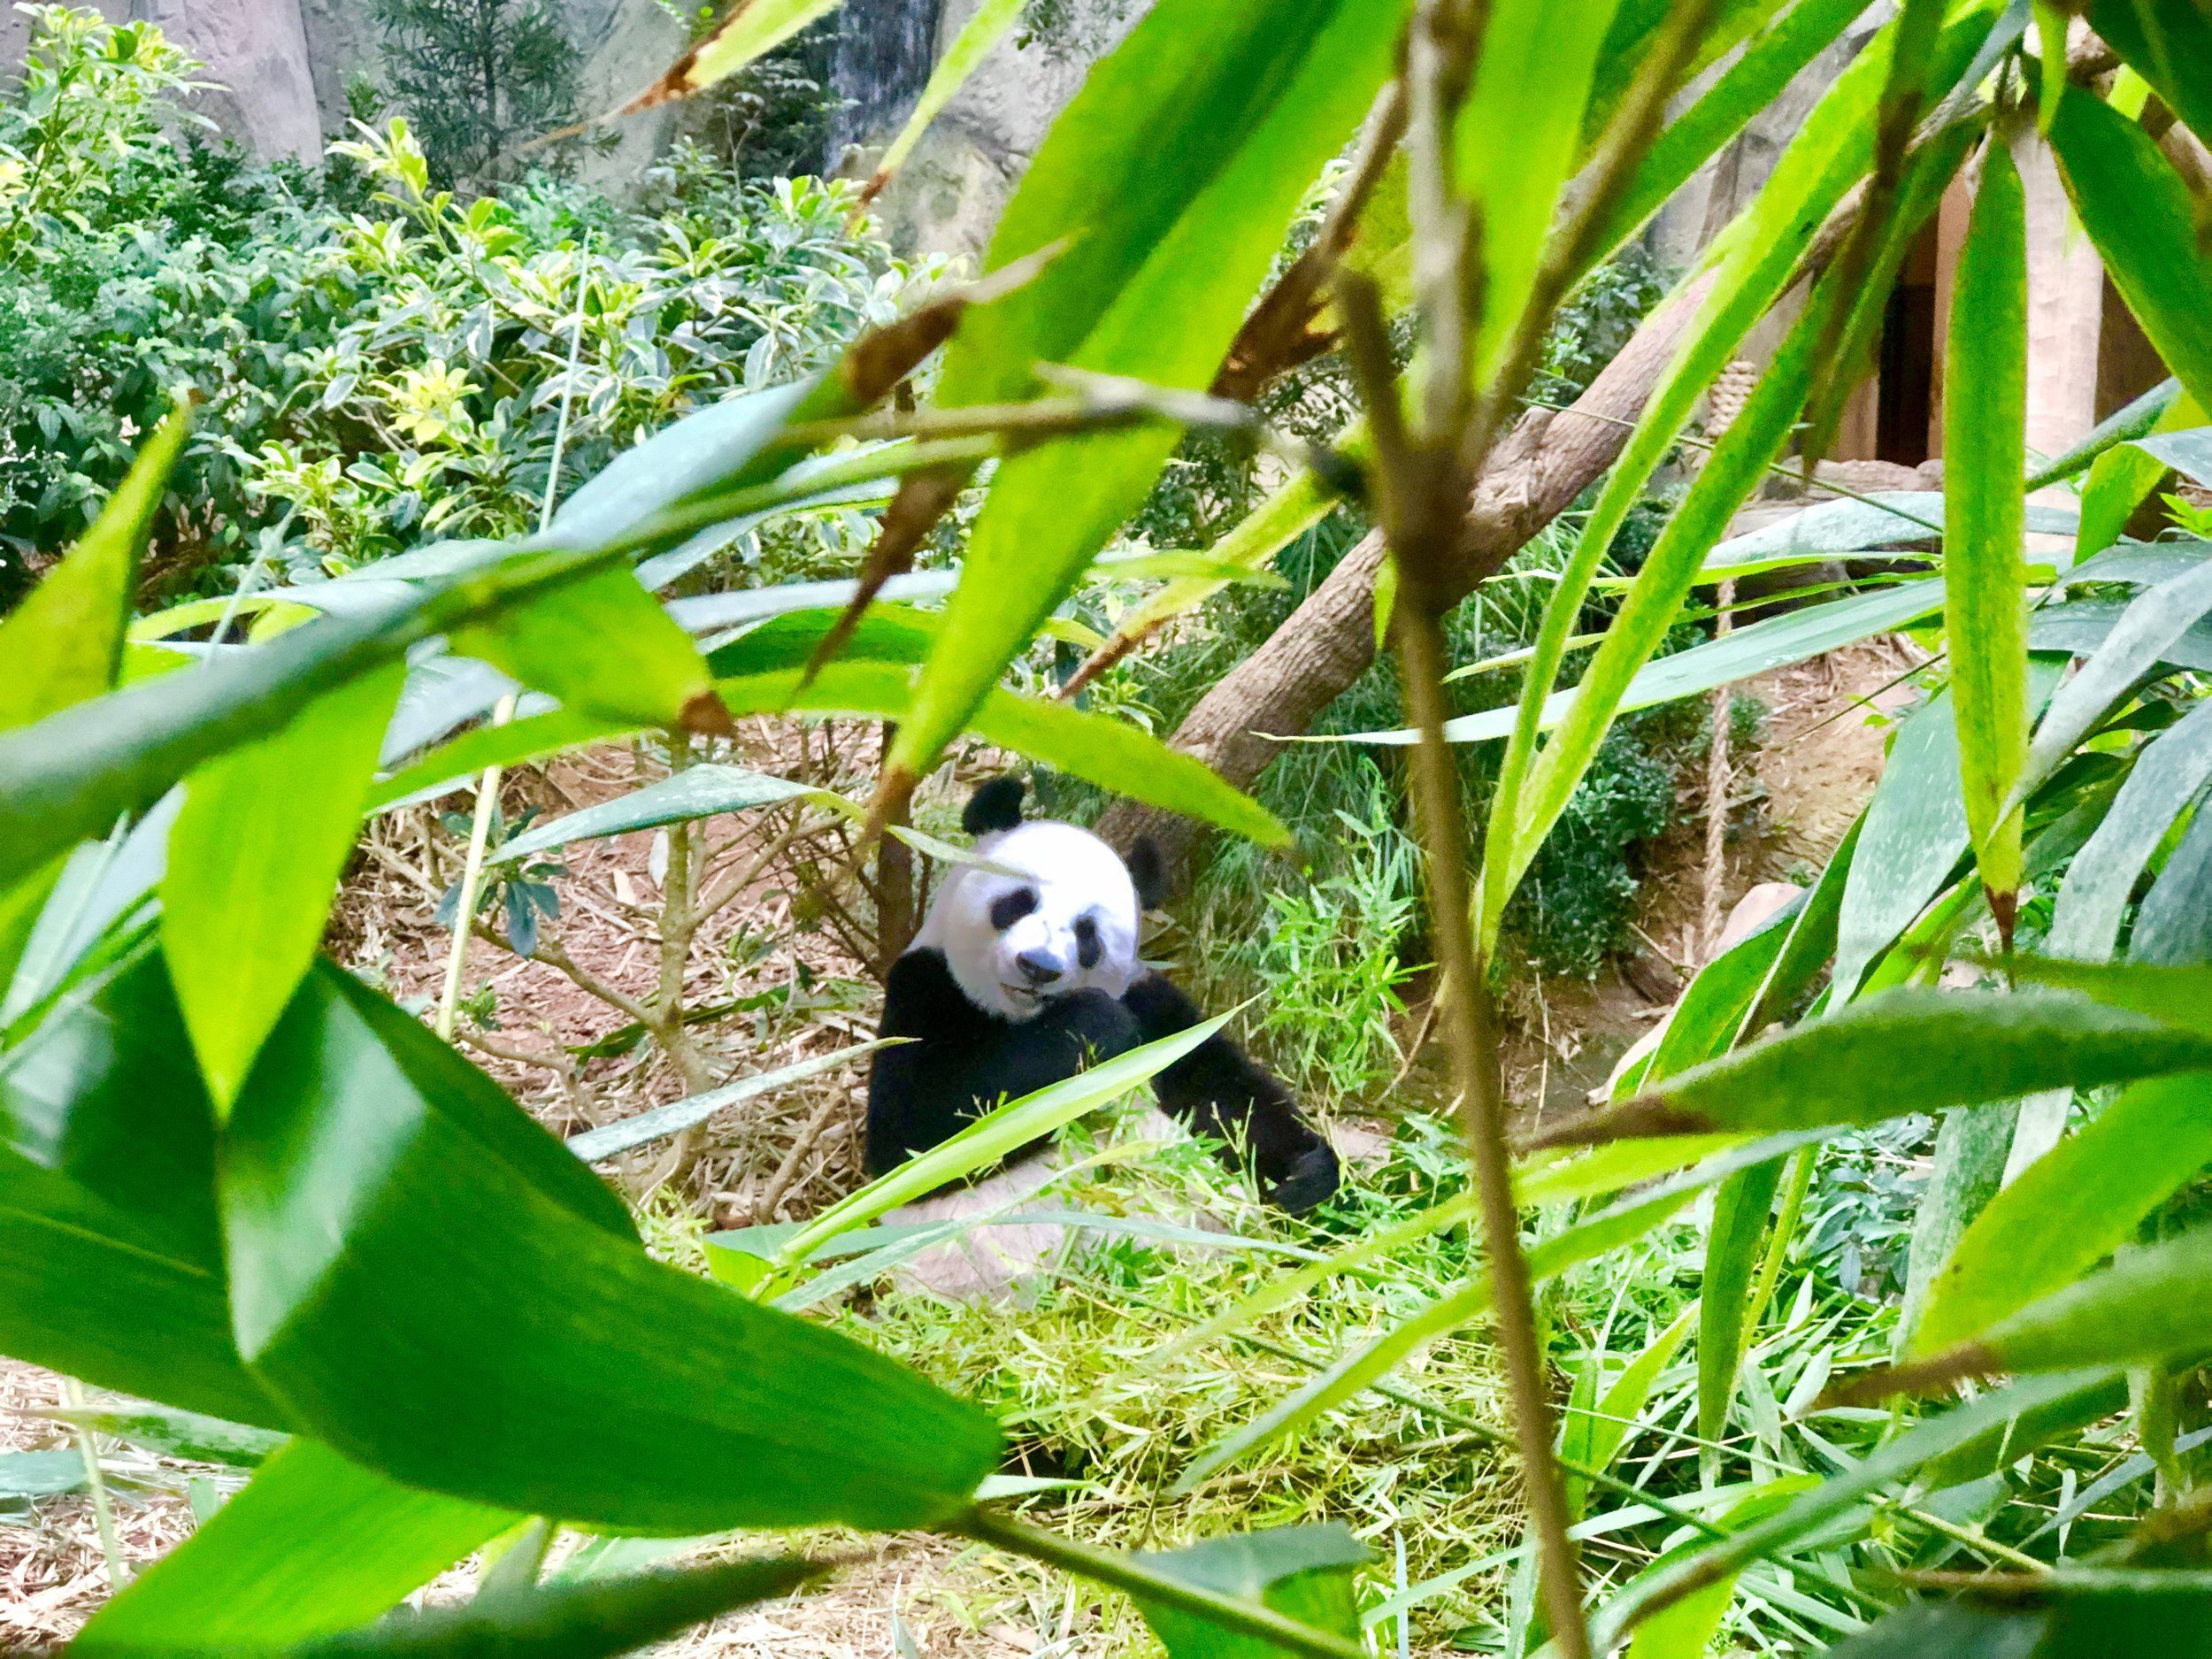 Singapore River Safari Giant Panda